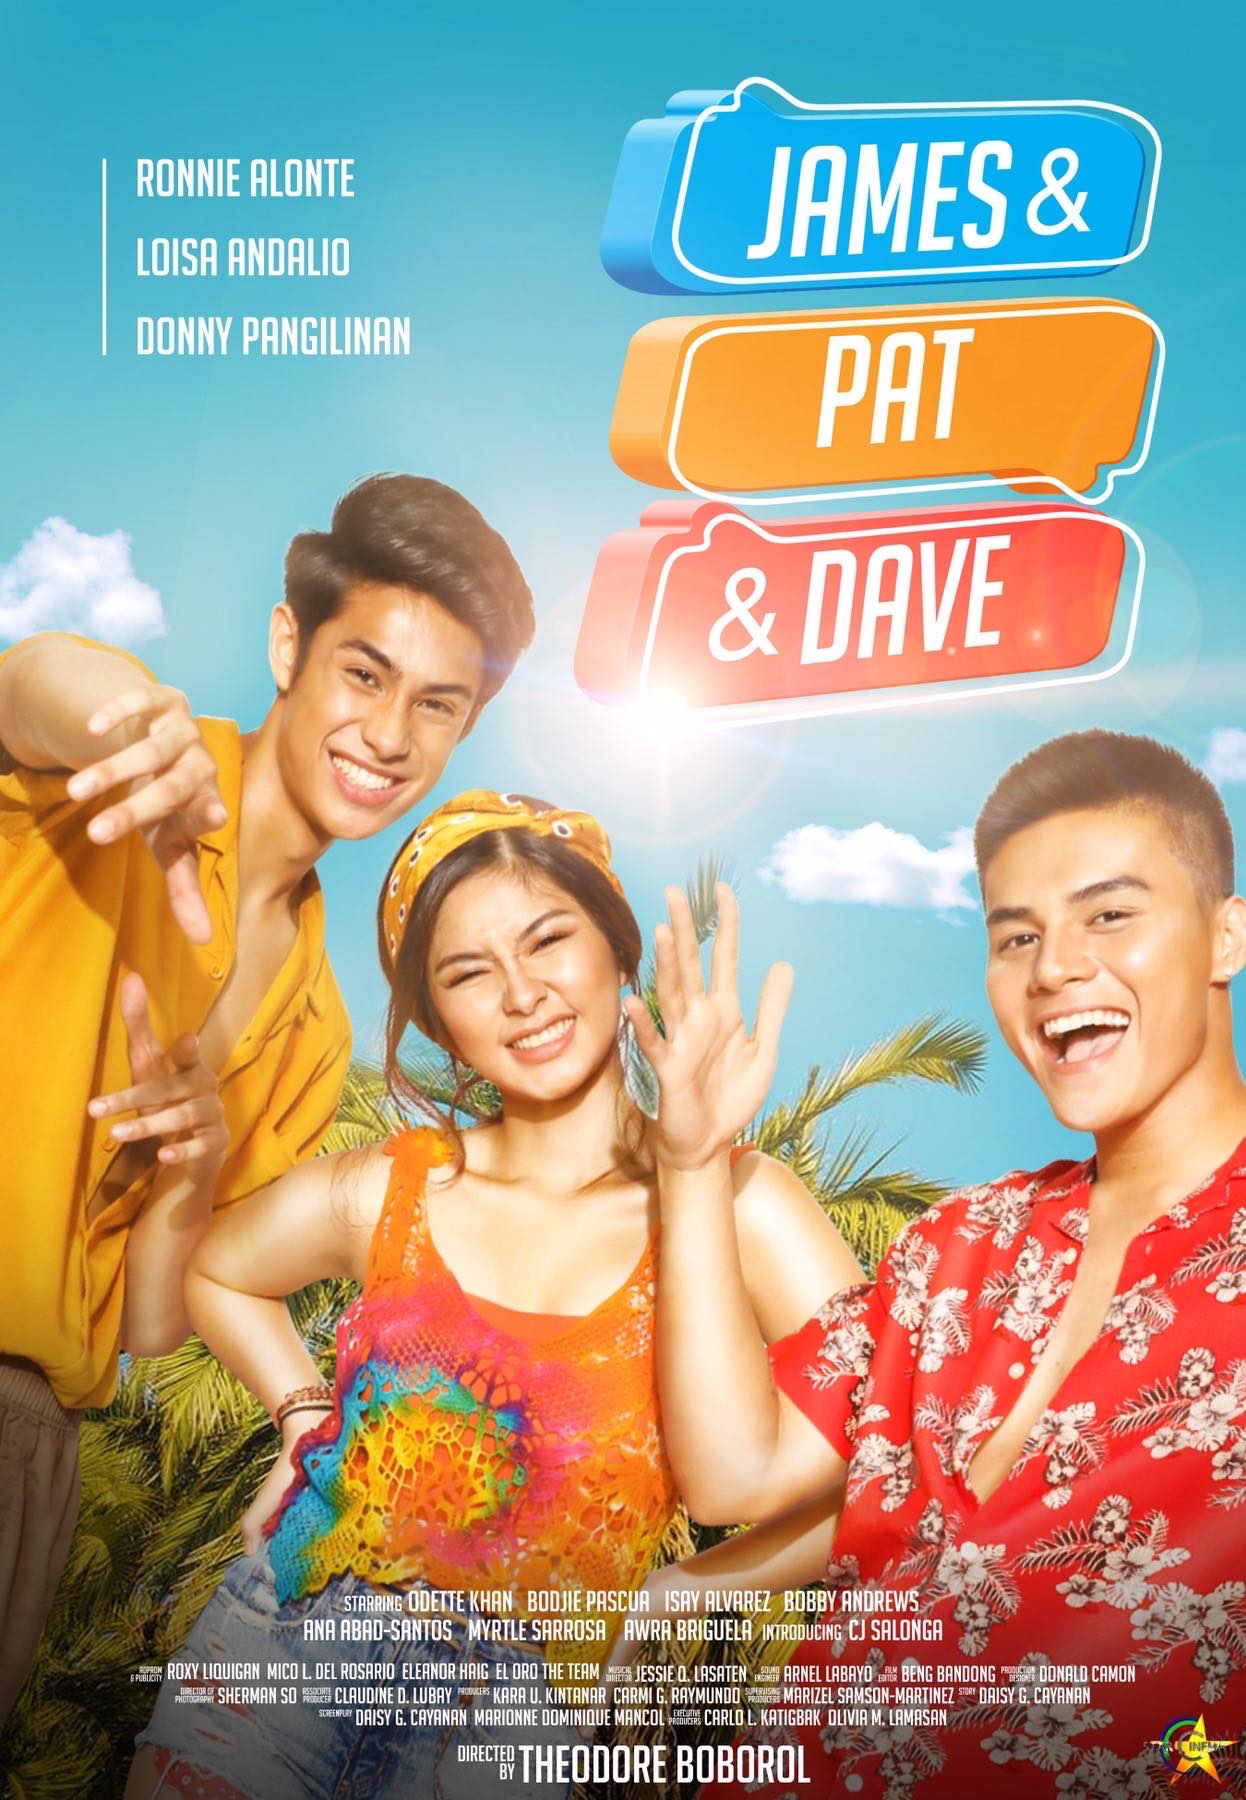 James & Pat & Dave Subtitle Indonesia